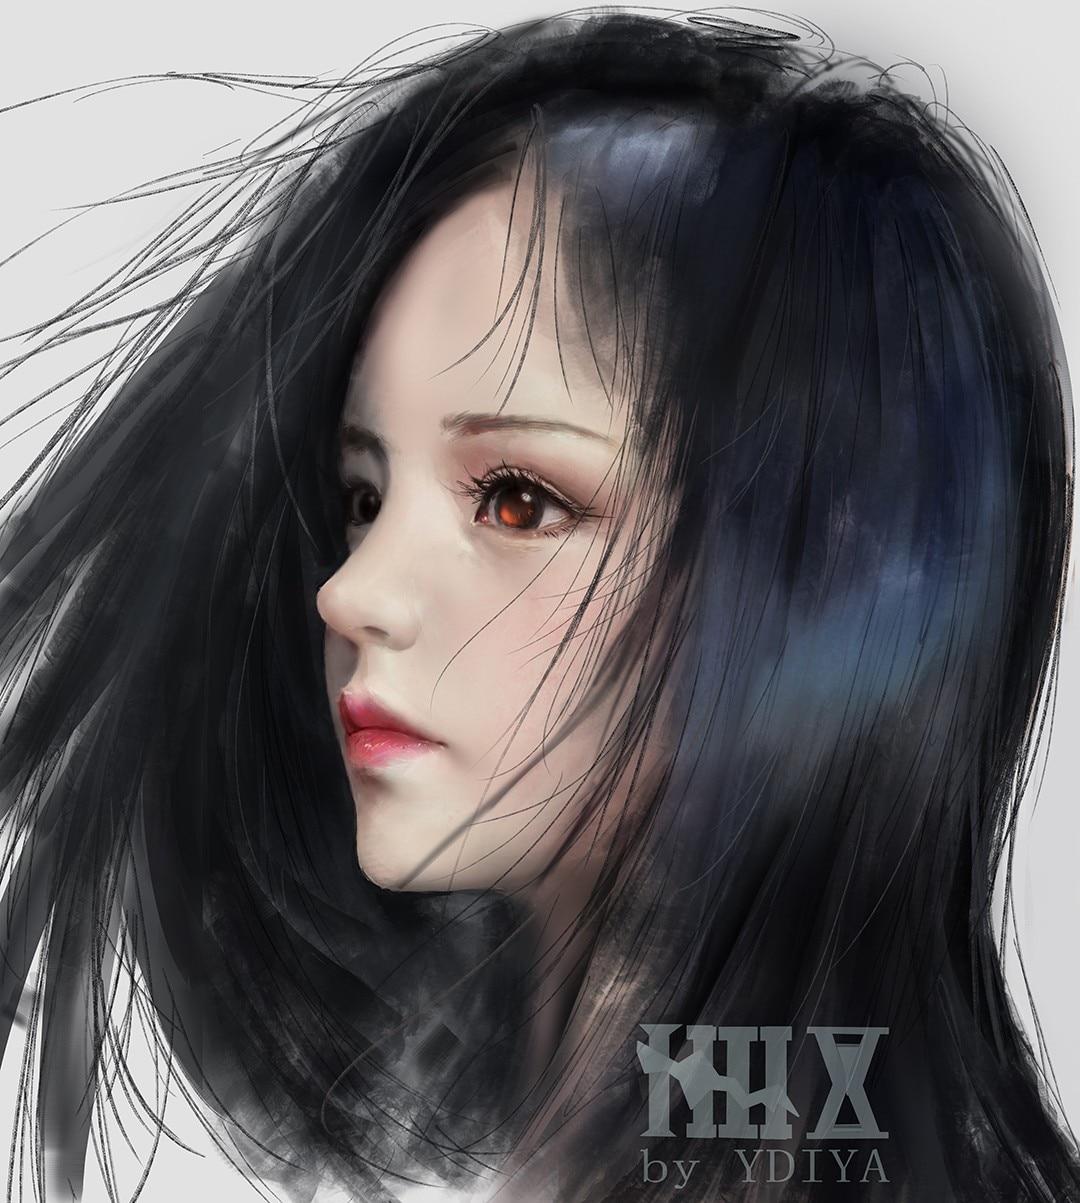 [P站]pixiv官网画师YDIYA id:17862658 同鬼刀风格 第二弹